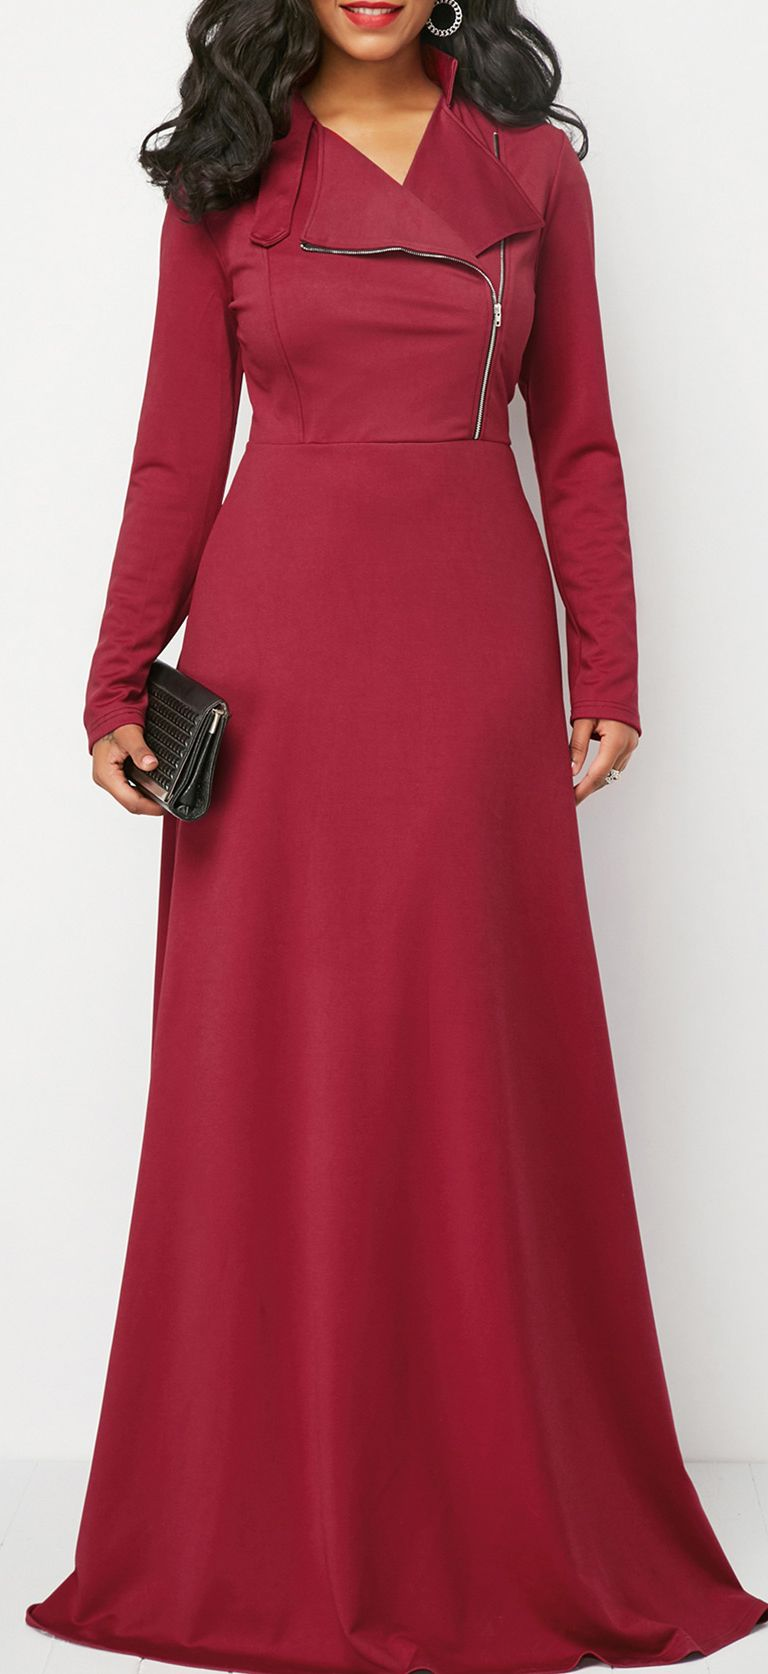 Wine Red Zipper Front Long Sleeve Maxi Dress. | Dresses | Pinterest ...